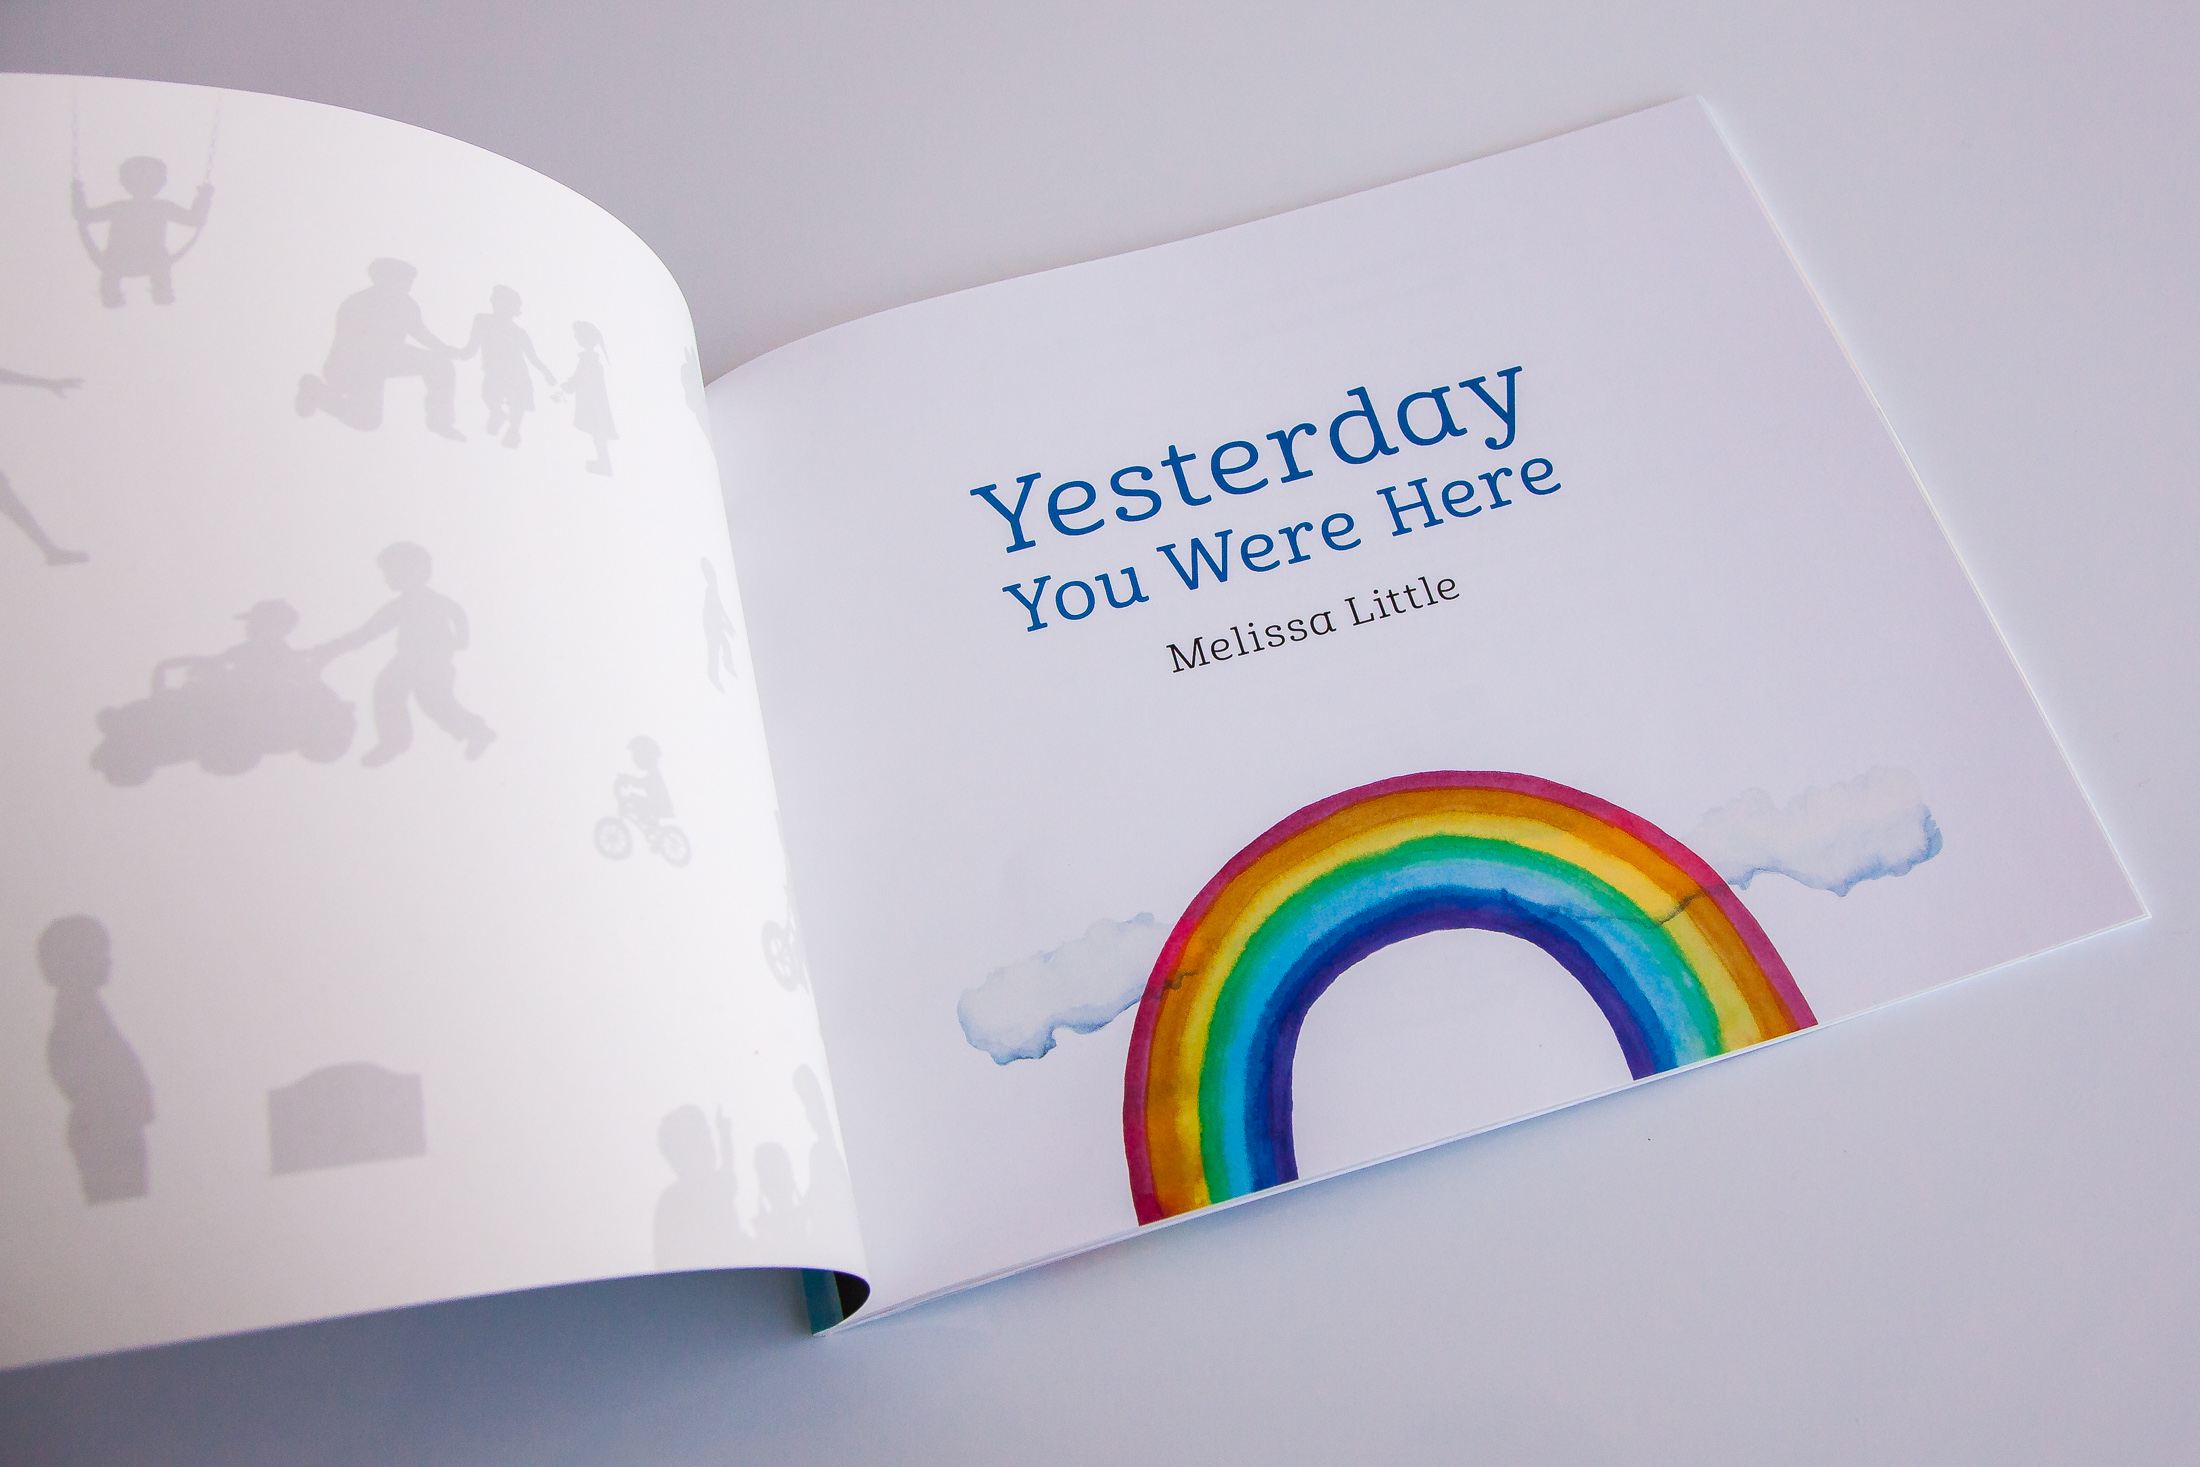 Yesterday You Were Here - IMG_5724.jpg